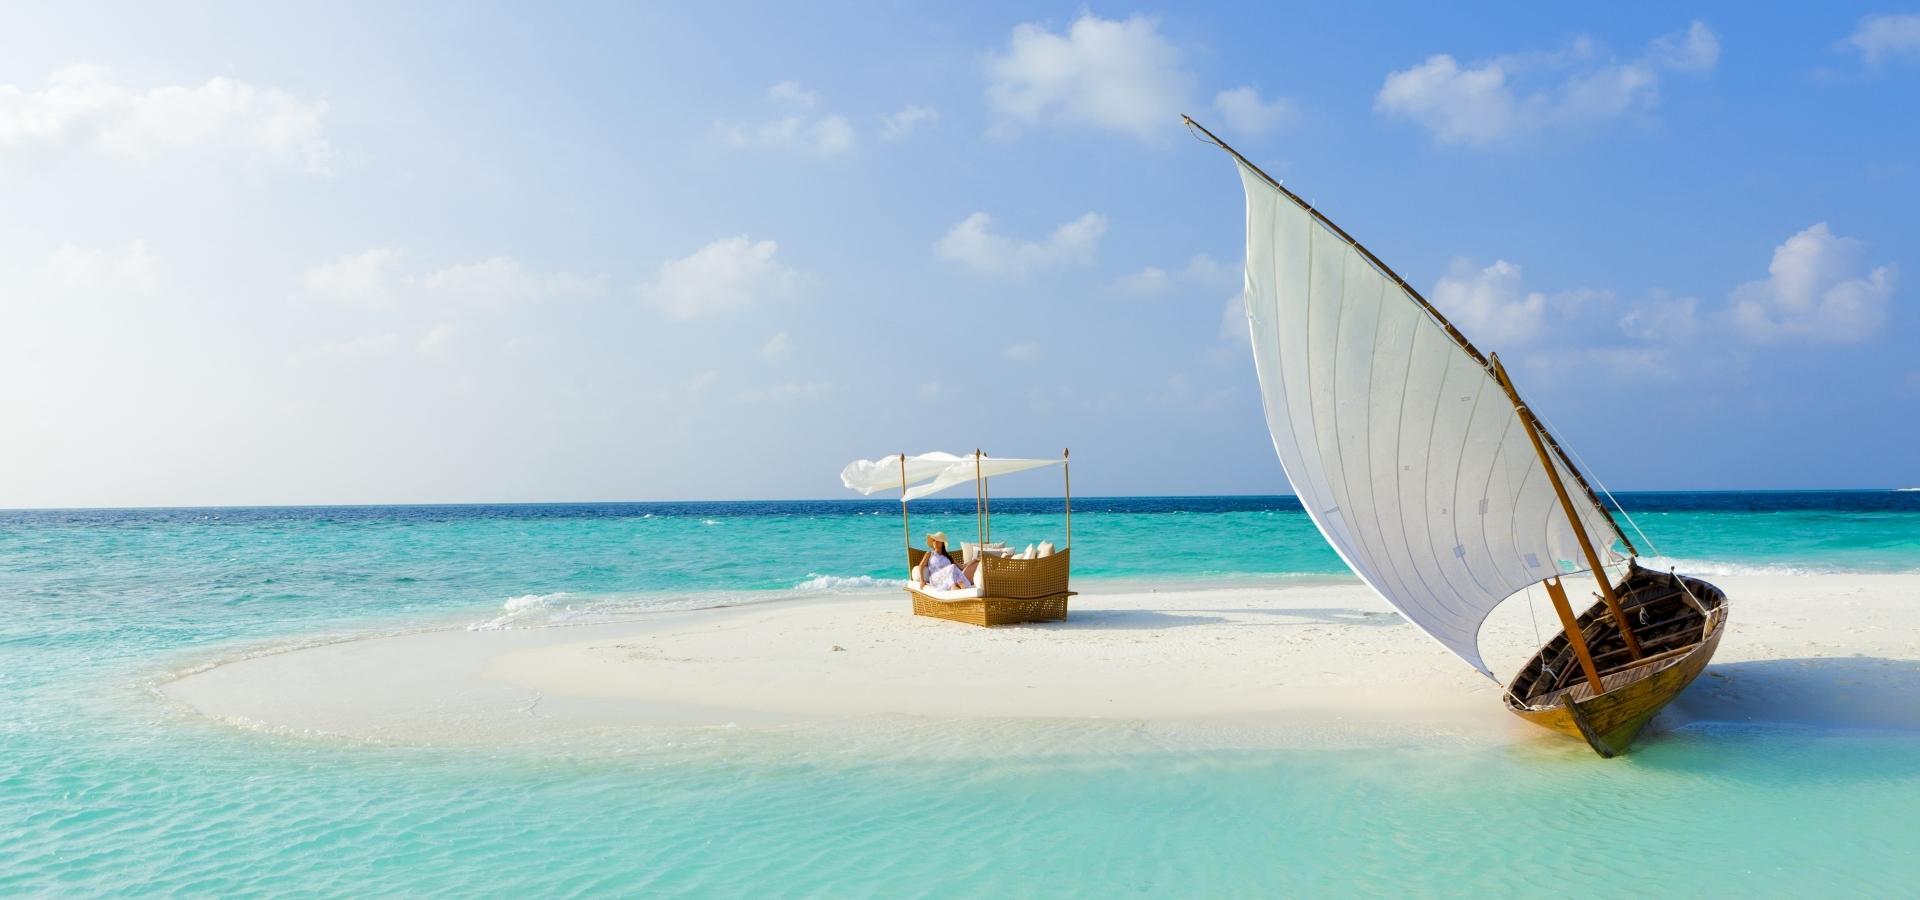 Maldivas - Villas Universal Baros Maldives